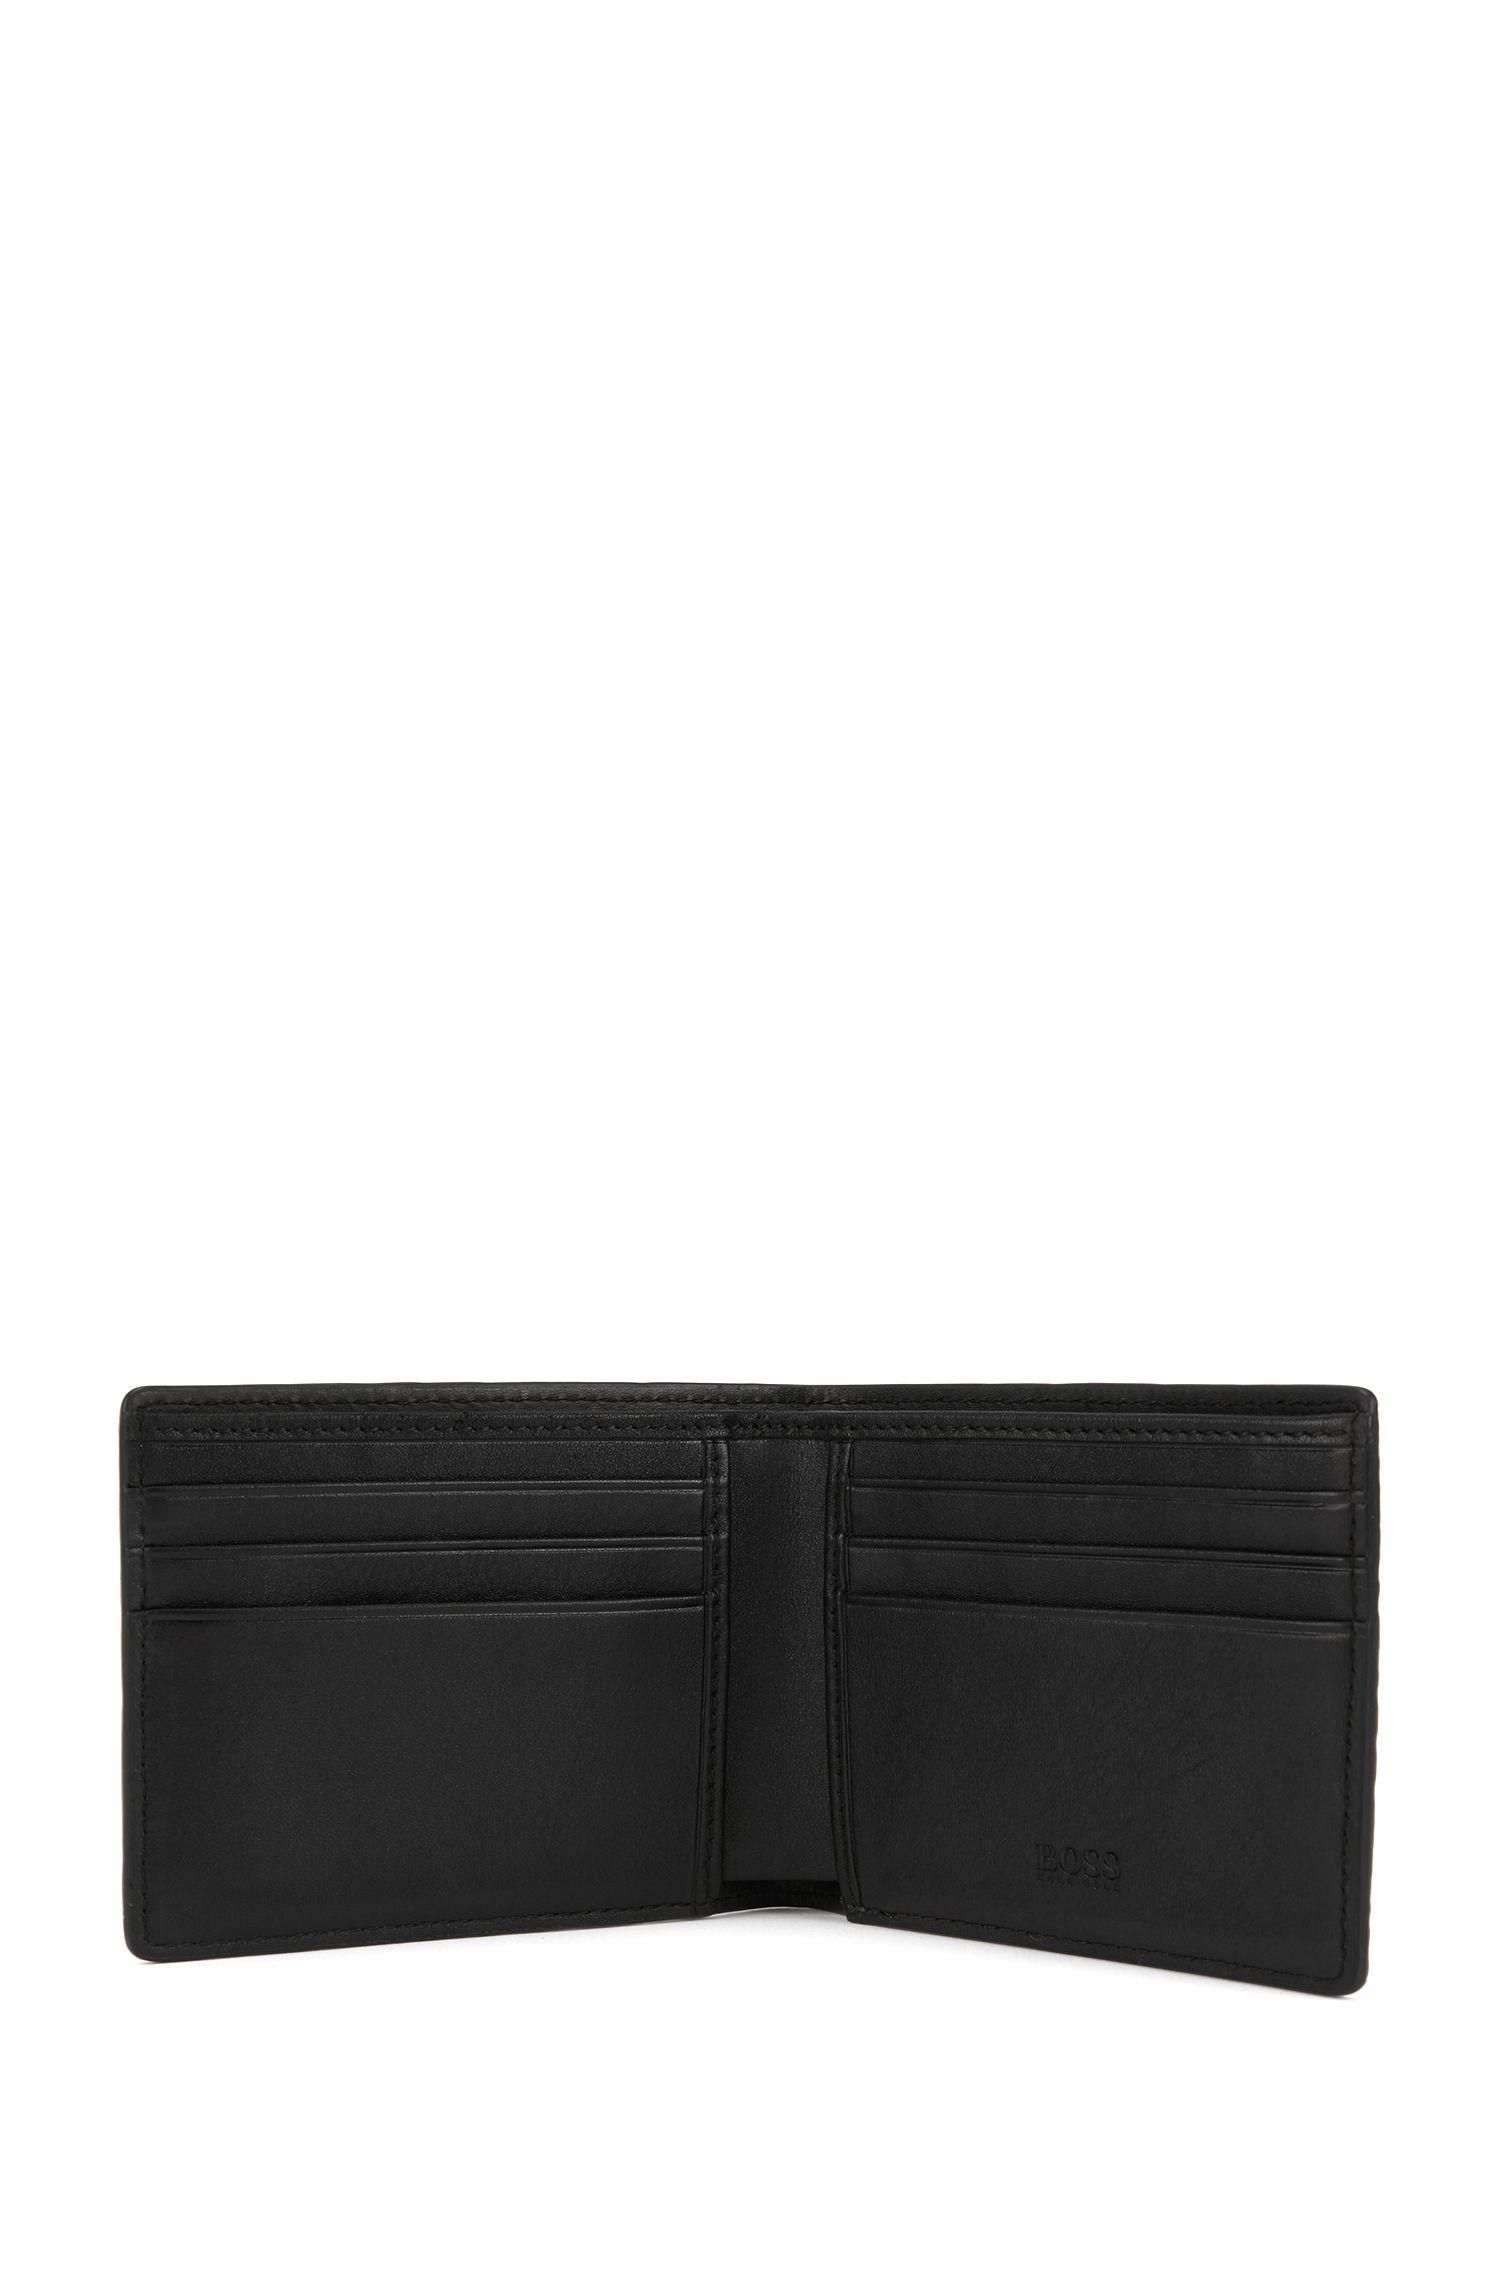 Billfold wallet in Italian calf leather with lizard print, Black